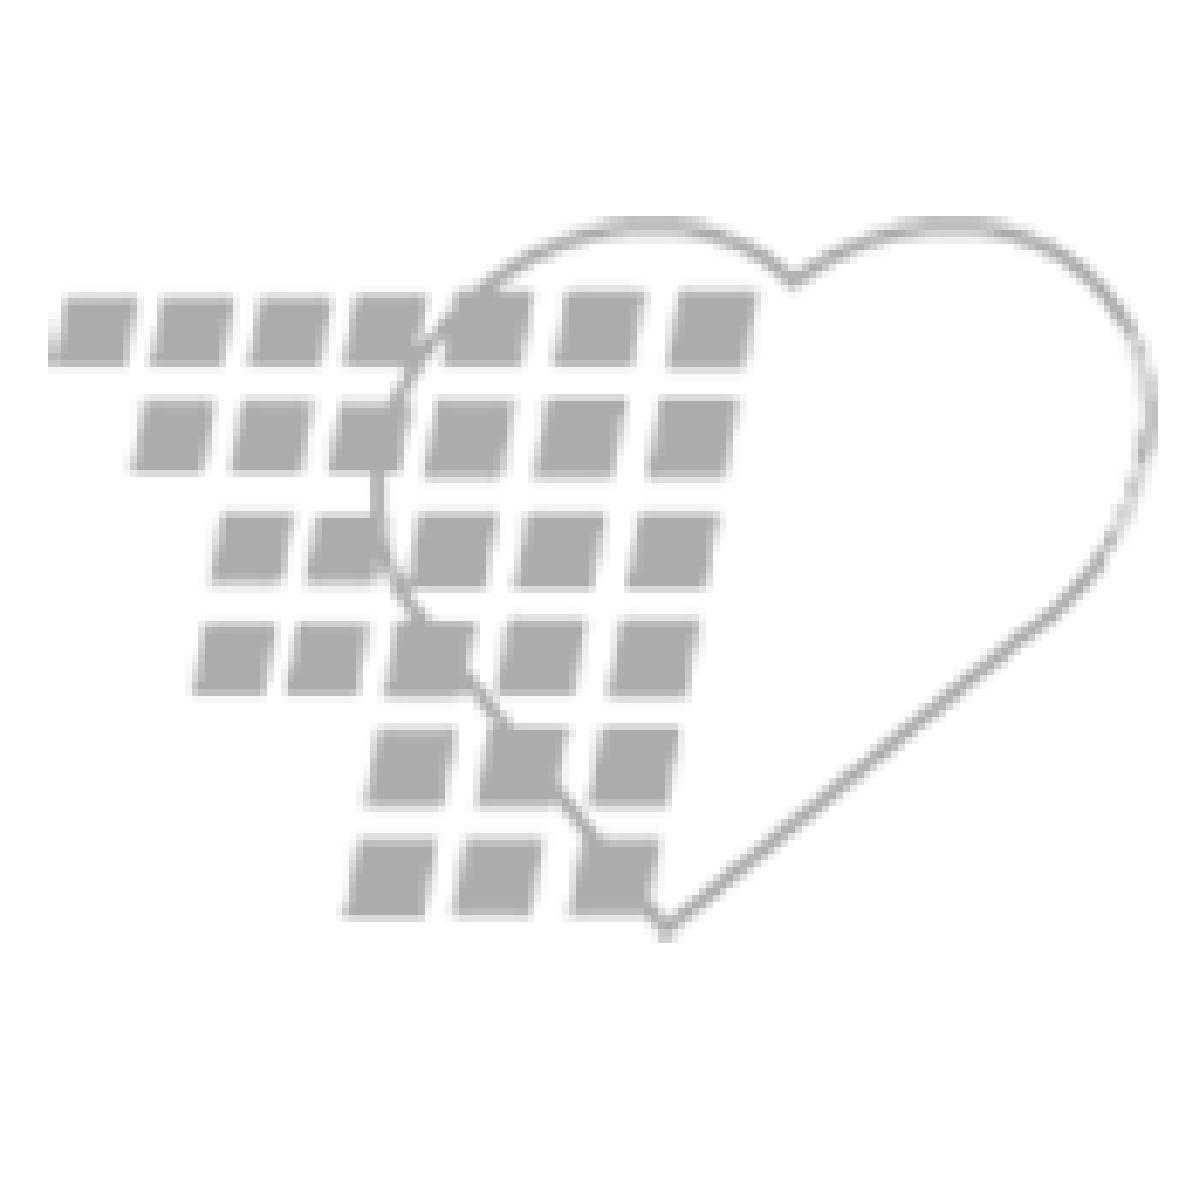 06-93-0041 - Demo Dose® Tenormn 50 mg - 100 Pills/Box